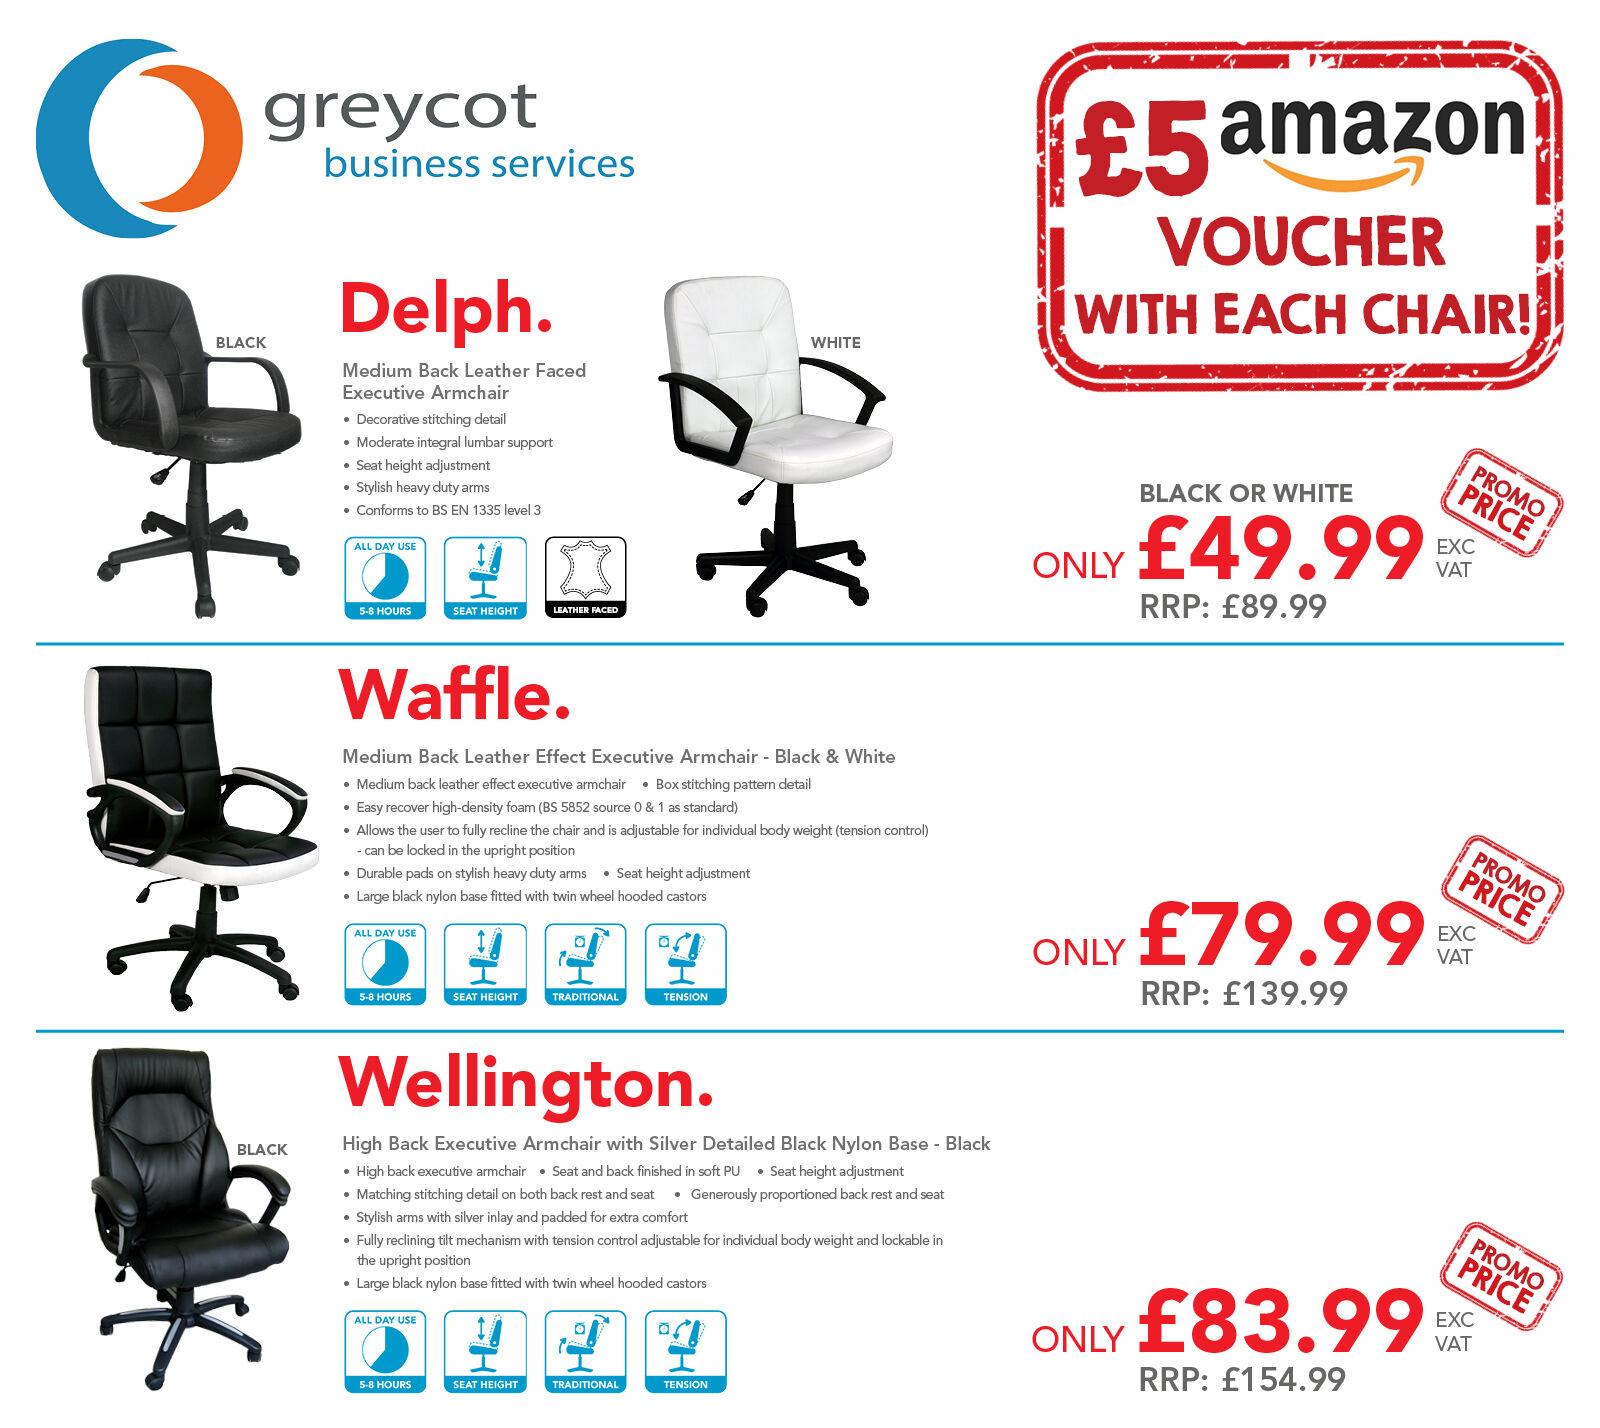 Greycot Business Services Ltd